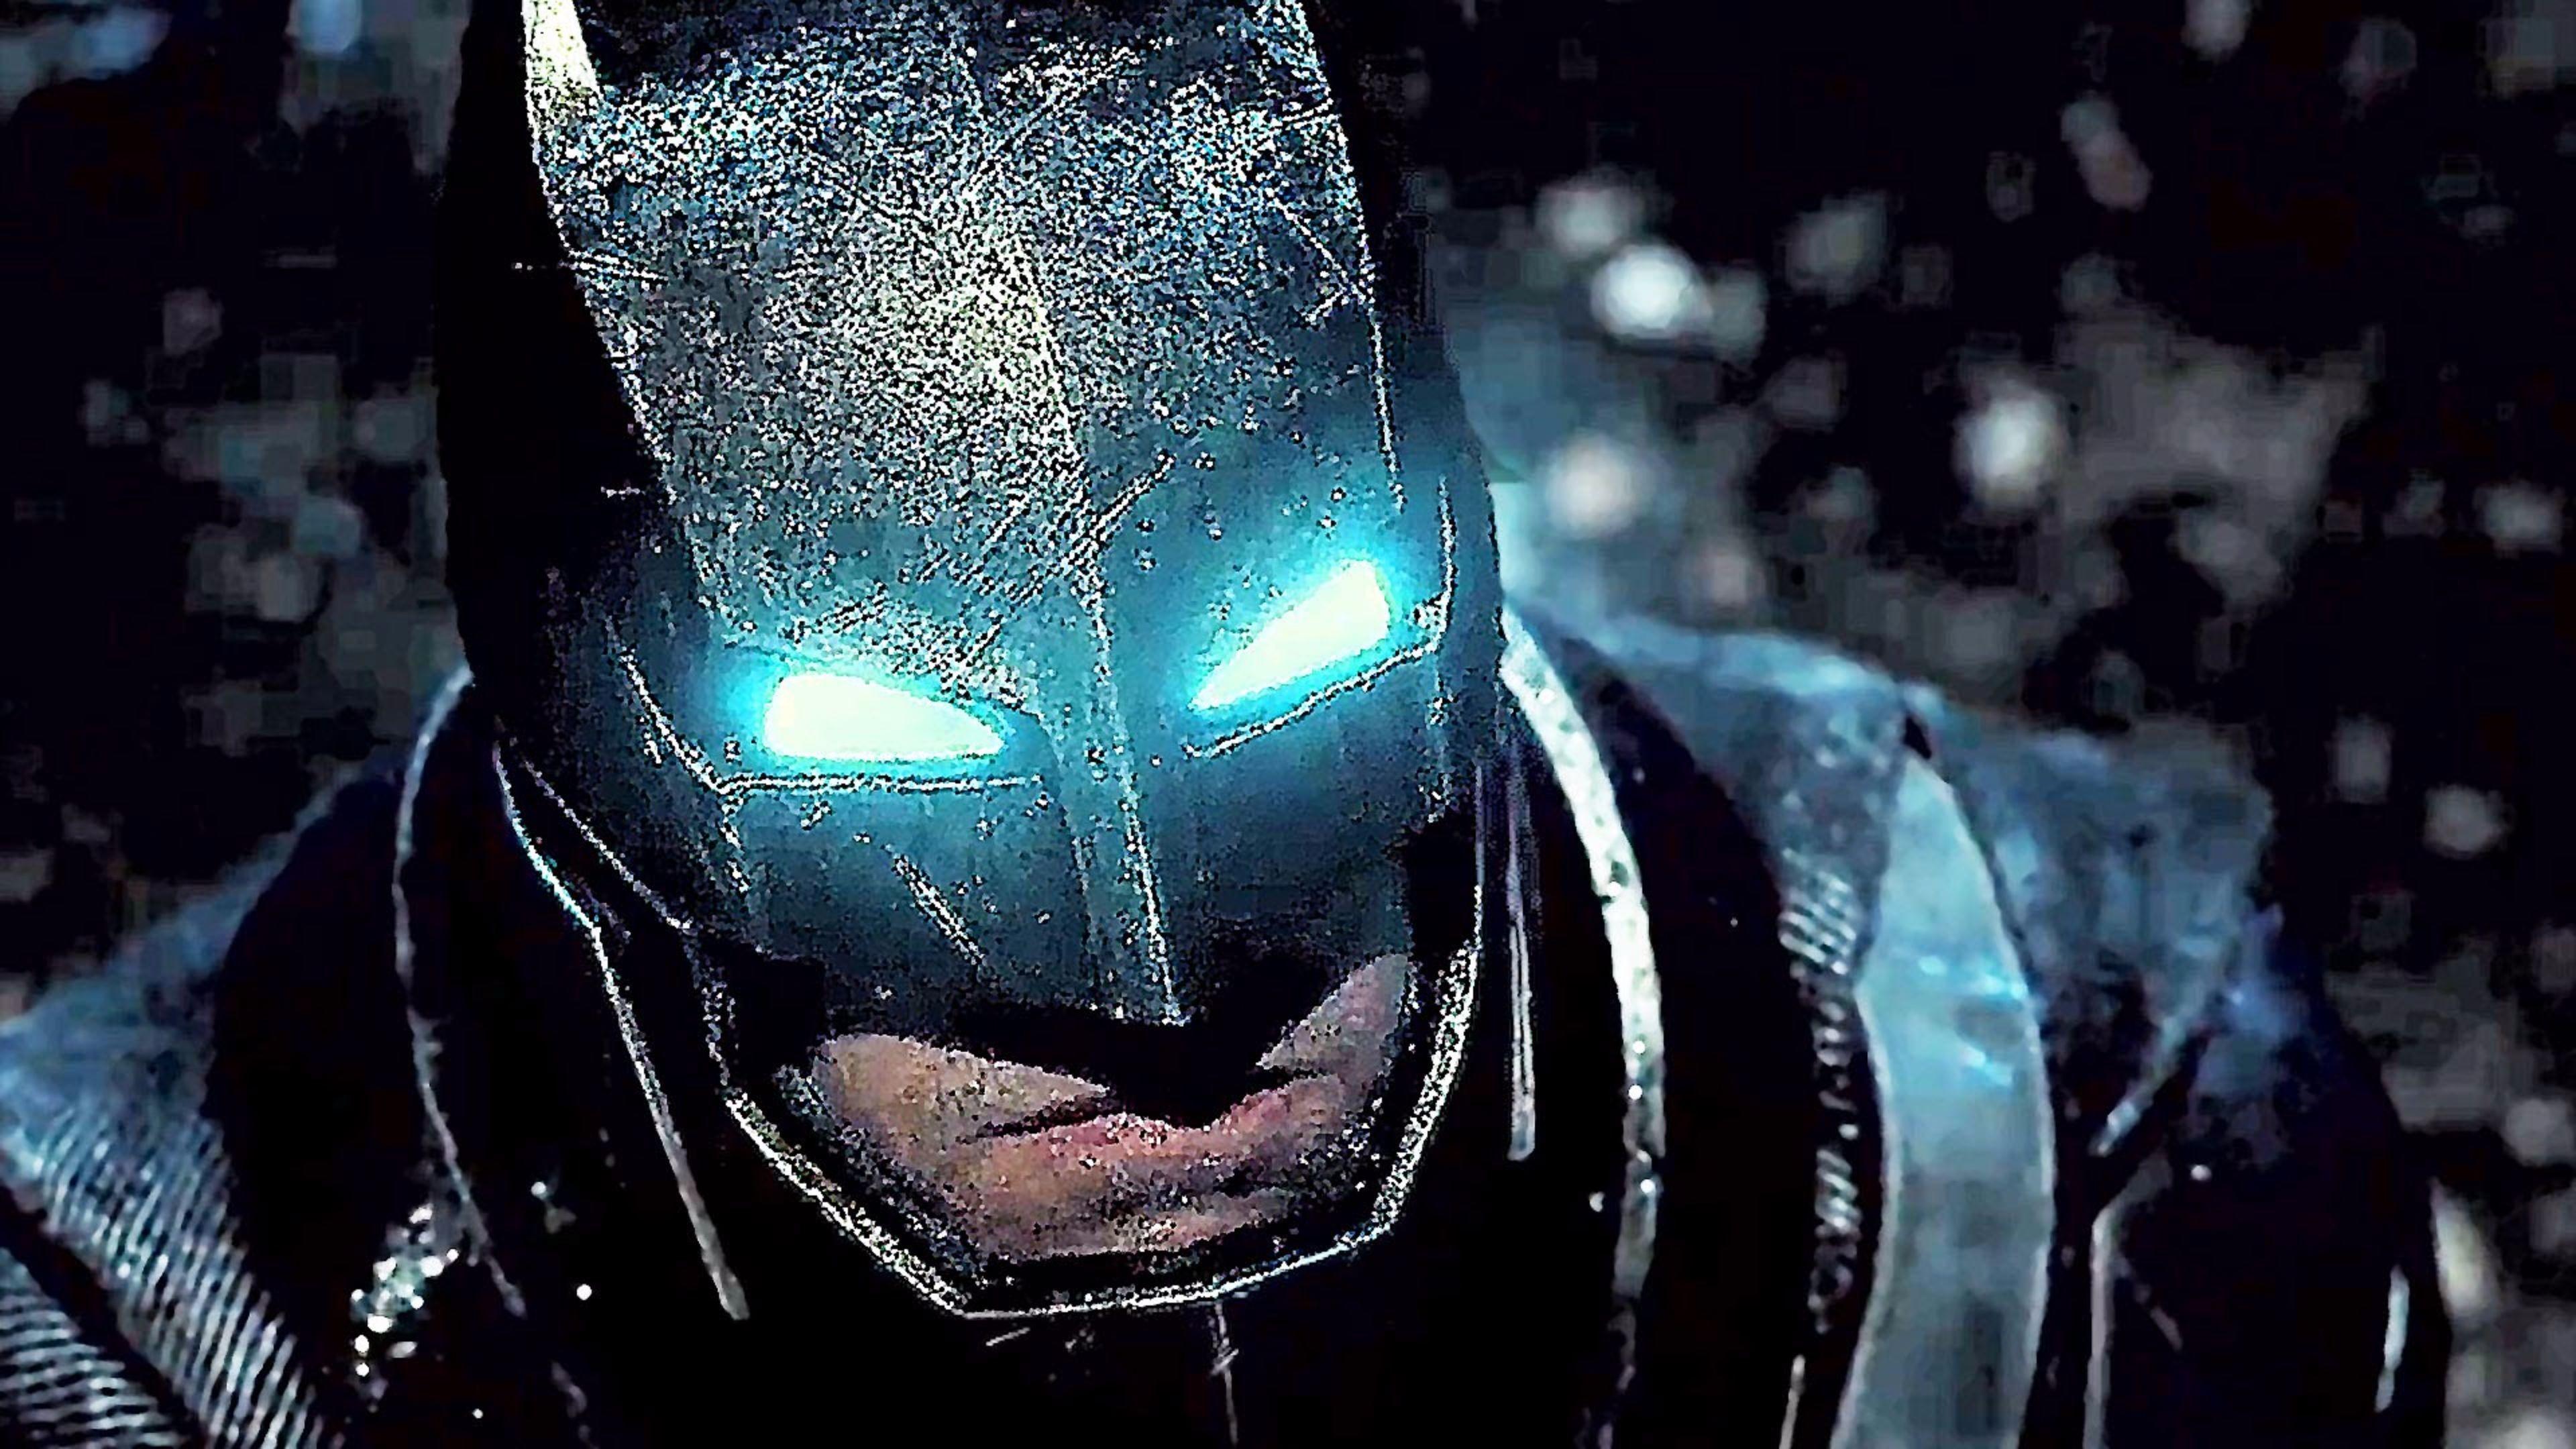 Batman 4K Wallpaper – image #732247